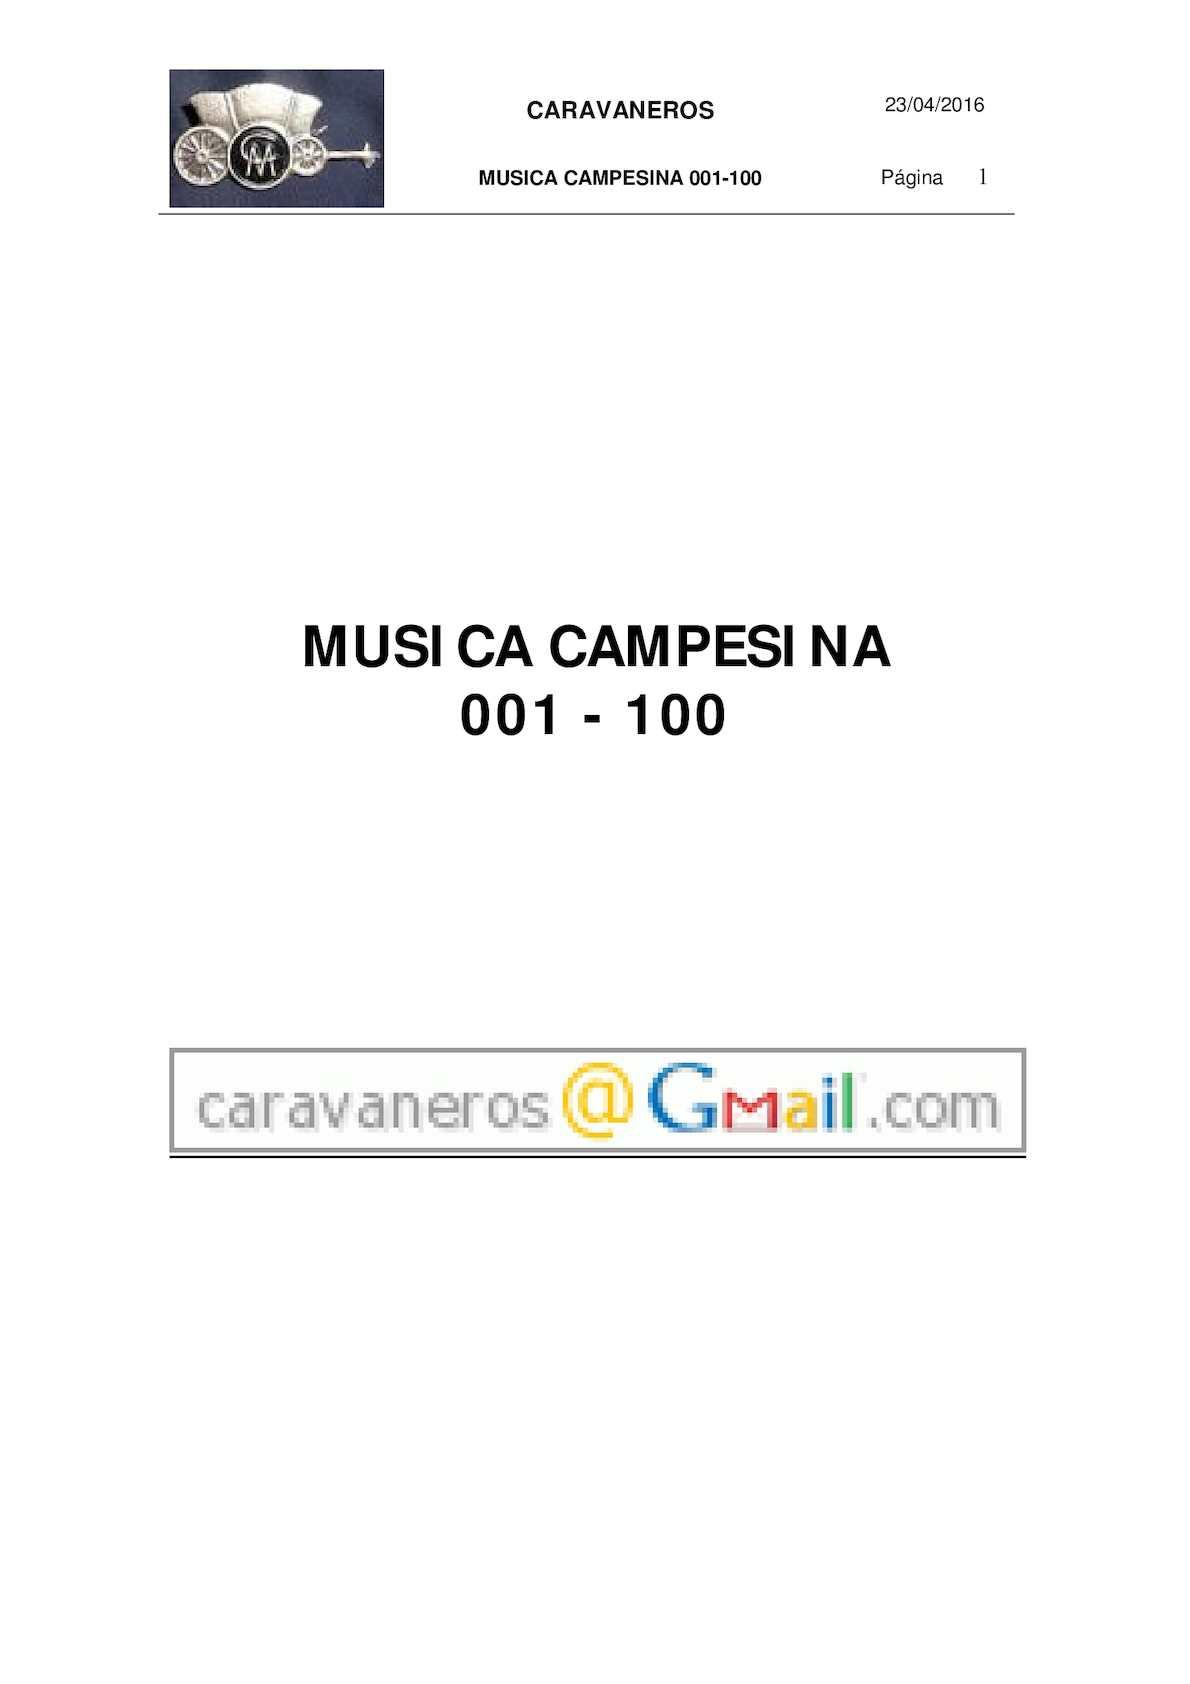 Calaméo - Caravaneros Memoria 10 01 Música Campesina 001 100